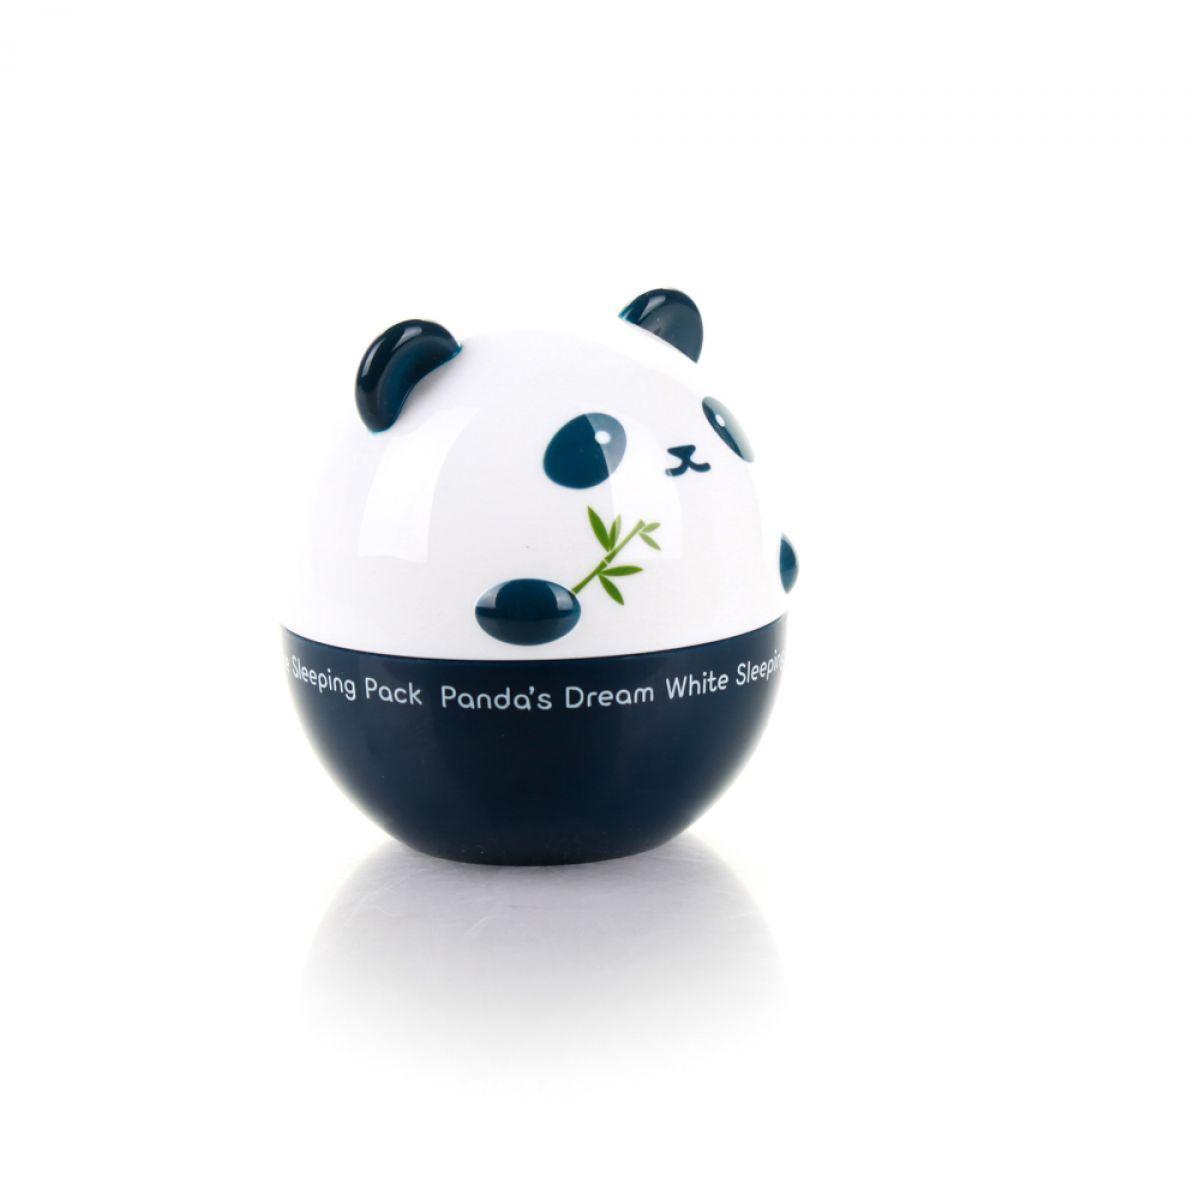 Ночная маска Tony Moly Panda's Dream White Sleeping Pack, отбеливающая (50ml)